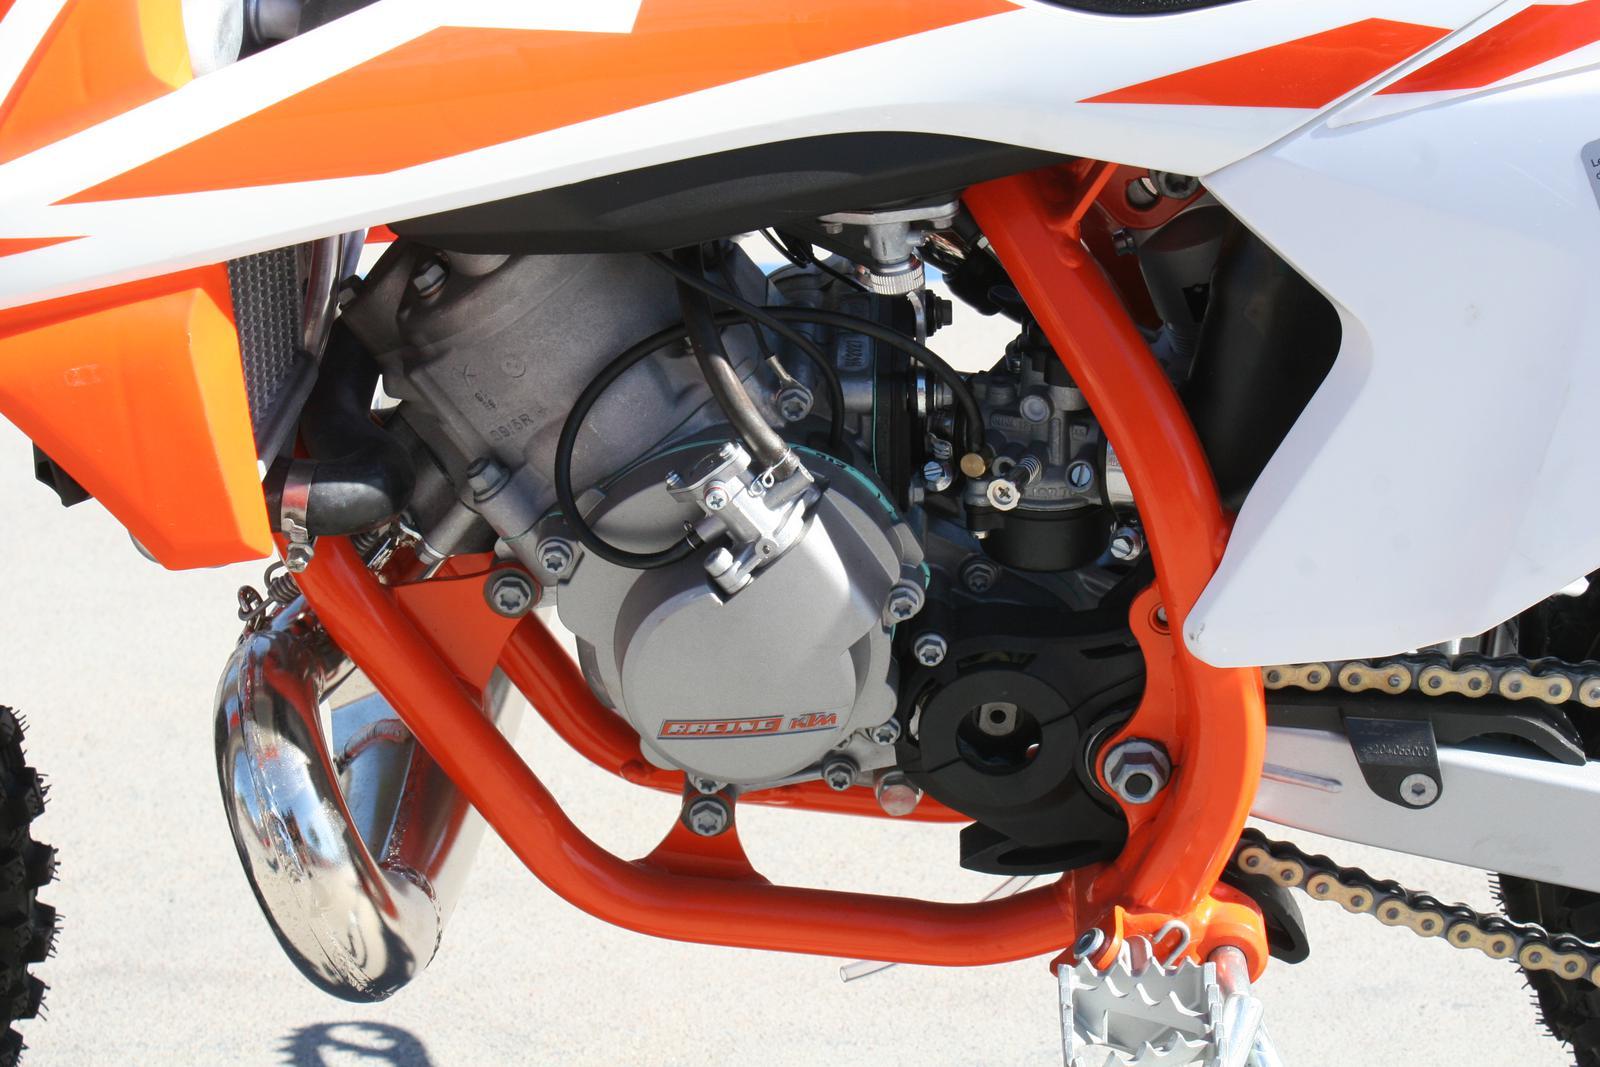 2019 KTM 50 SX MINI for sale in Scottsdale, AZ   GO AZ